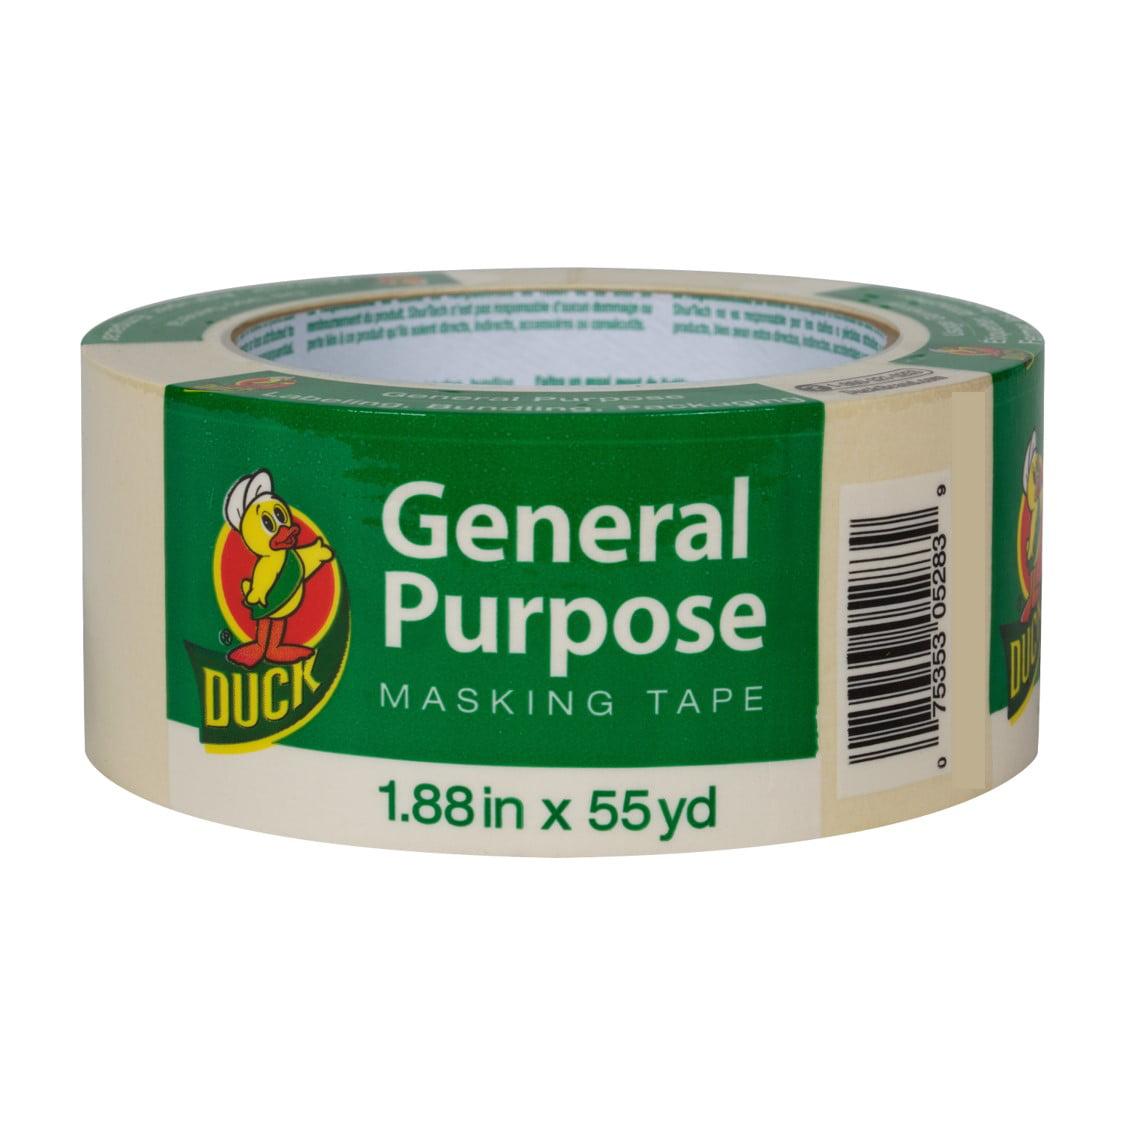 Duck Brand General Purpose Masking Tape - Beige, 1.88 in. x 55 yd.